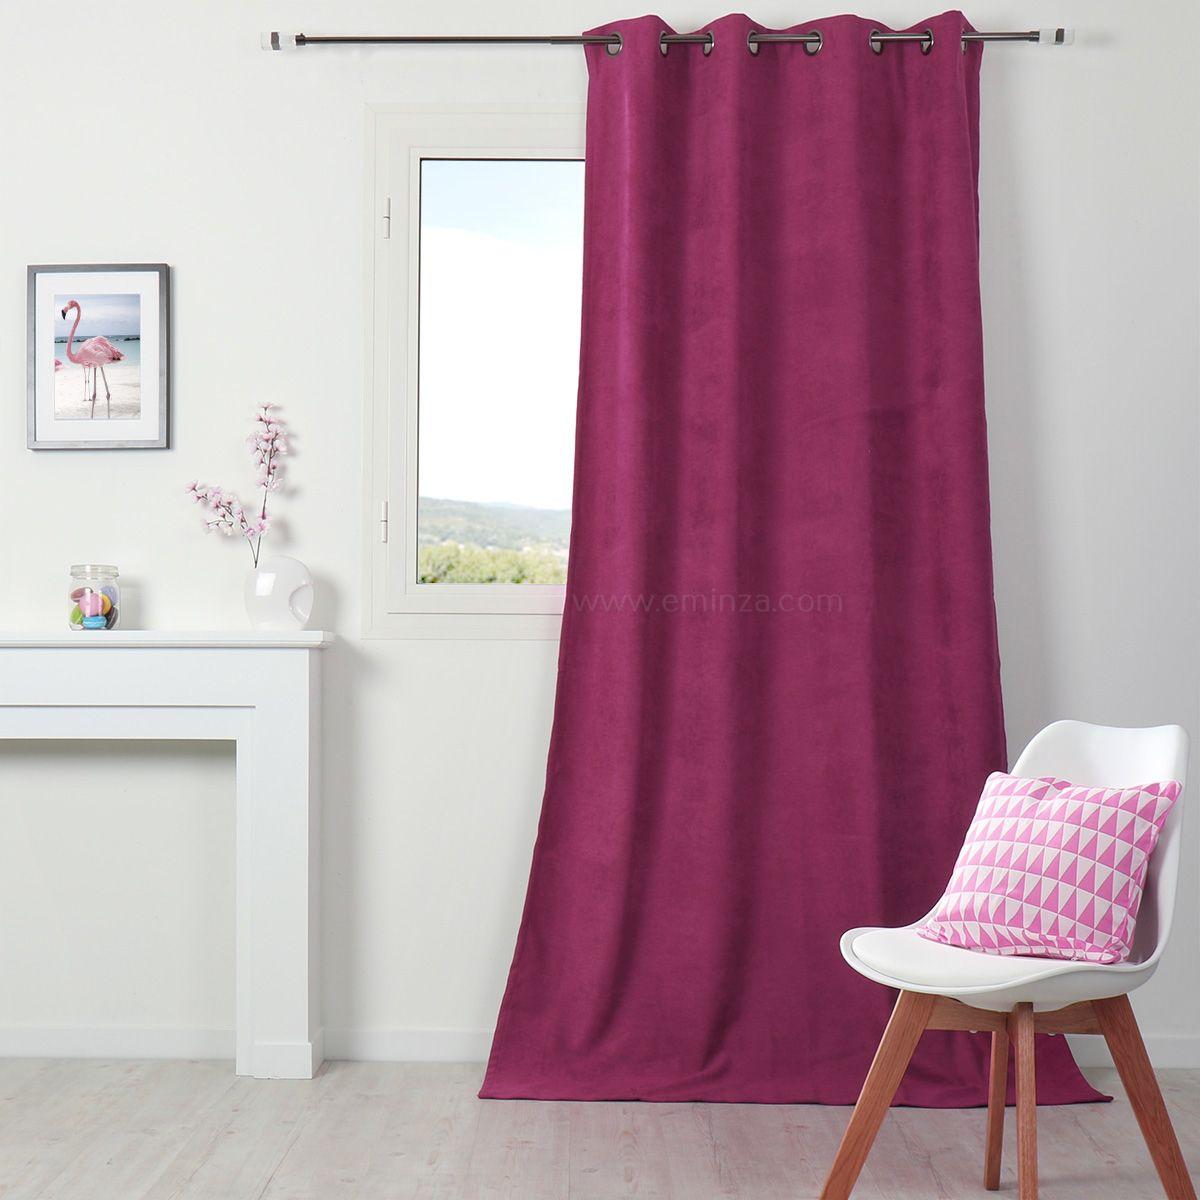 rideau occultant isolant 140 x h260 cm alaska framboise rideau isolant eminza. Black Bedroom Furniture Sets. Home Design Ideas